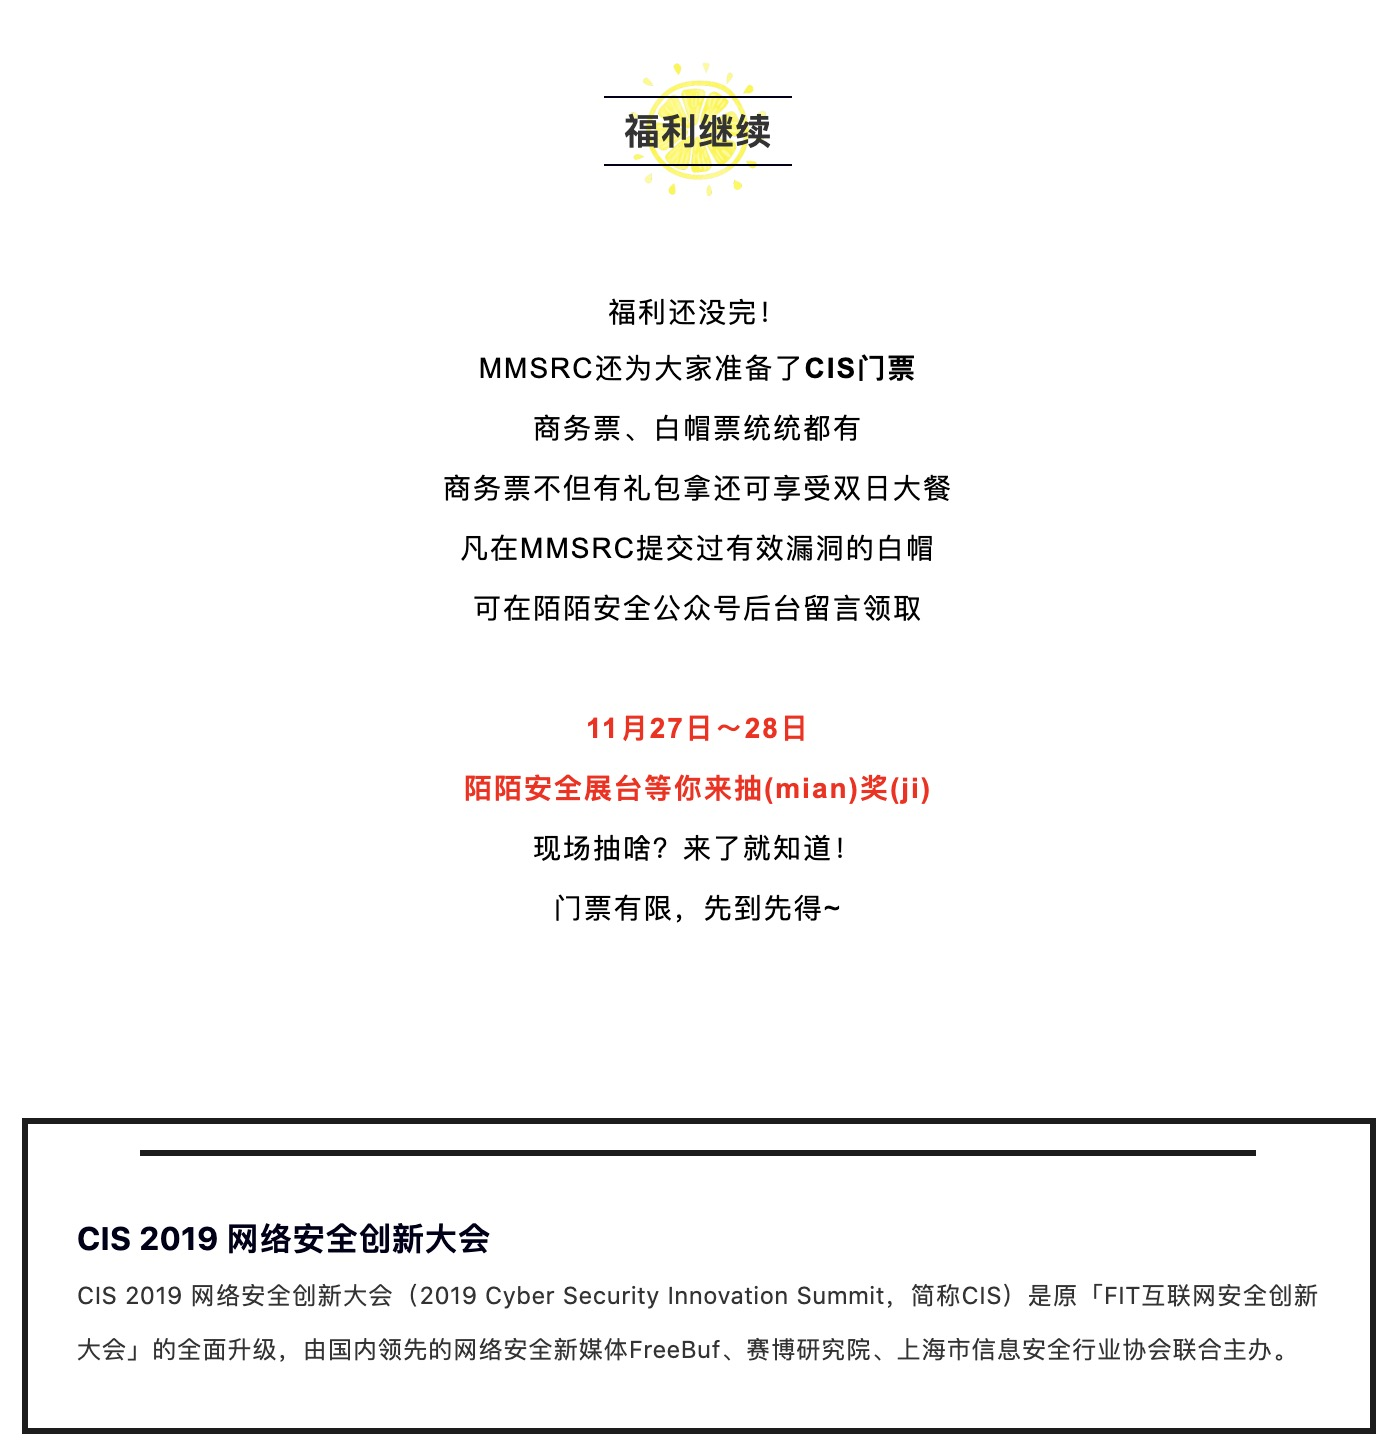 https://momo-mmsrc.oss-cn-hangzhou.aliyuncs.com/img-e92d963e-9ad9-3811-8a4b-87f05ac5f605.jpeg